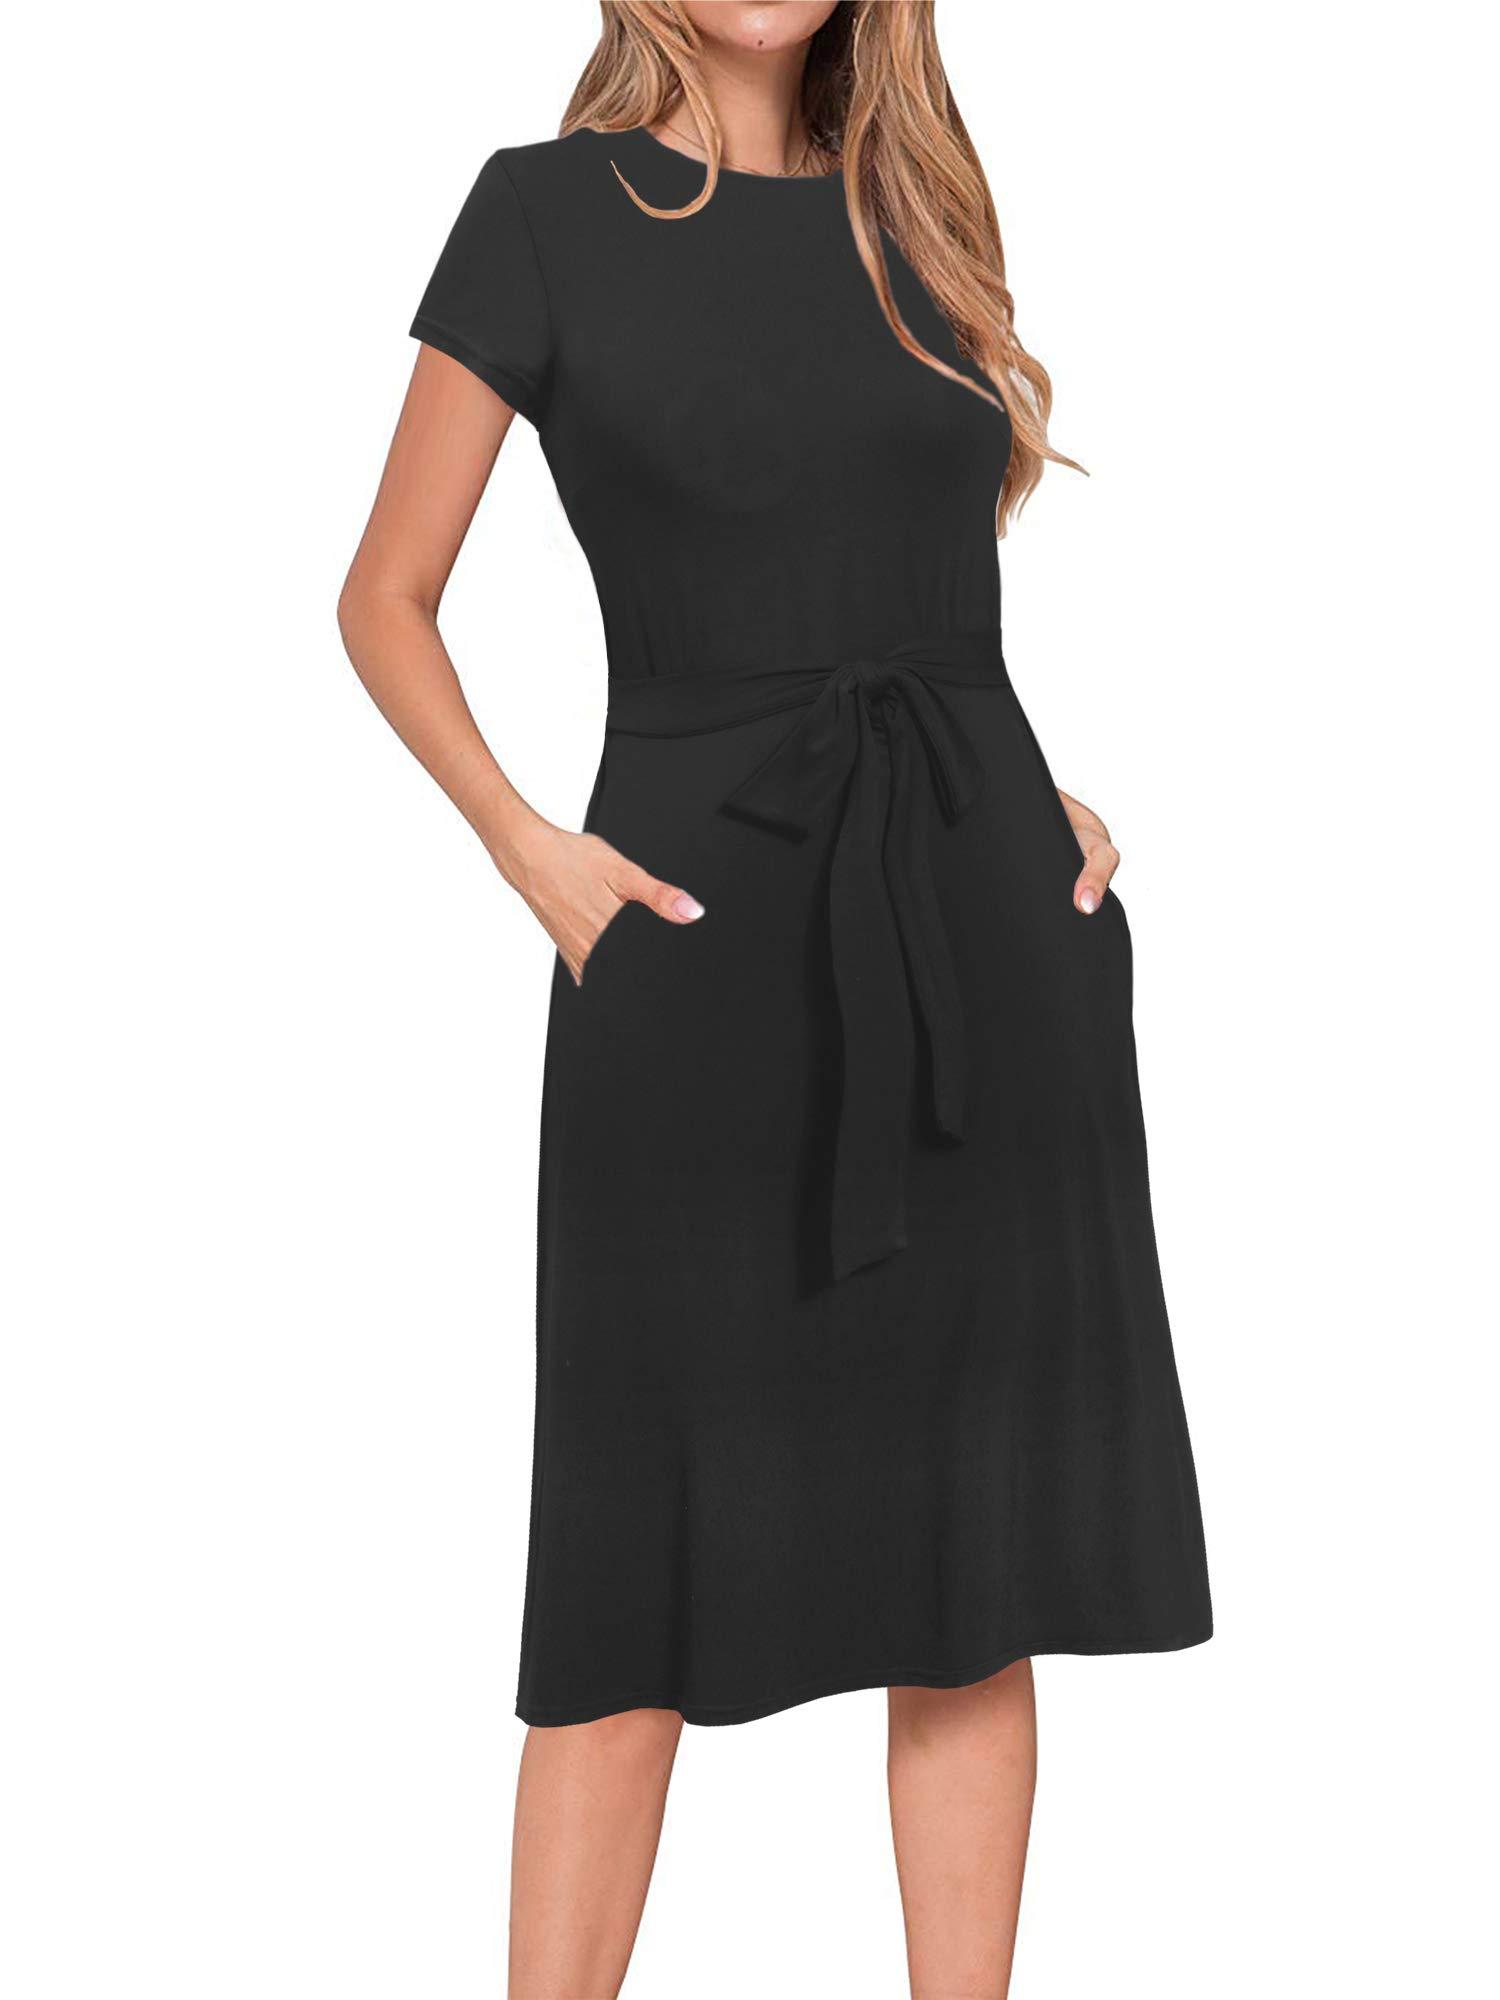 Alice & Elmer Women's Sundress Casual Beach Summer Solid Cotton Flattering A-Line Short Sleeve Black Midi Dress with Pockets